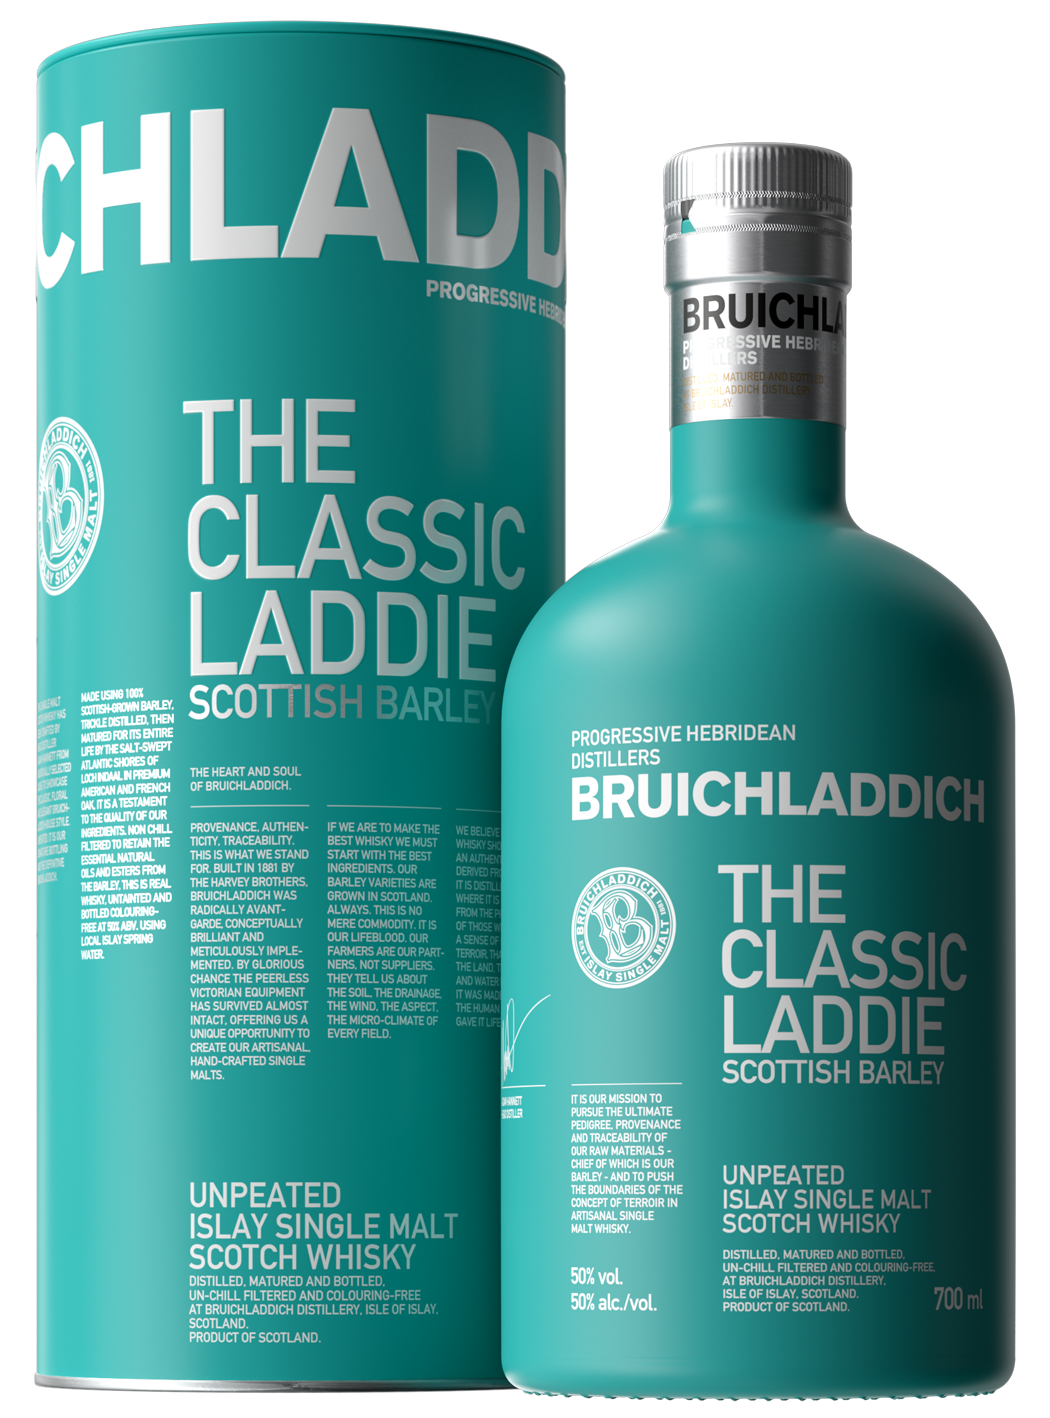 Bruichladdich, The Classic Laddie